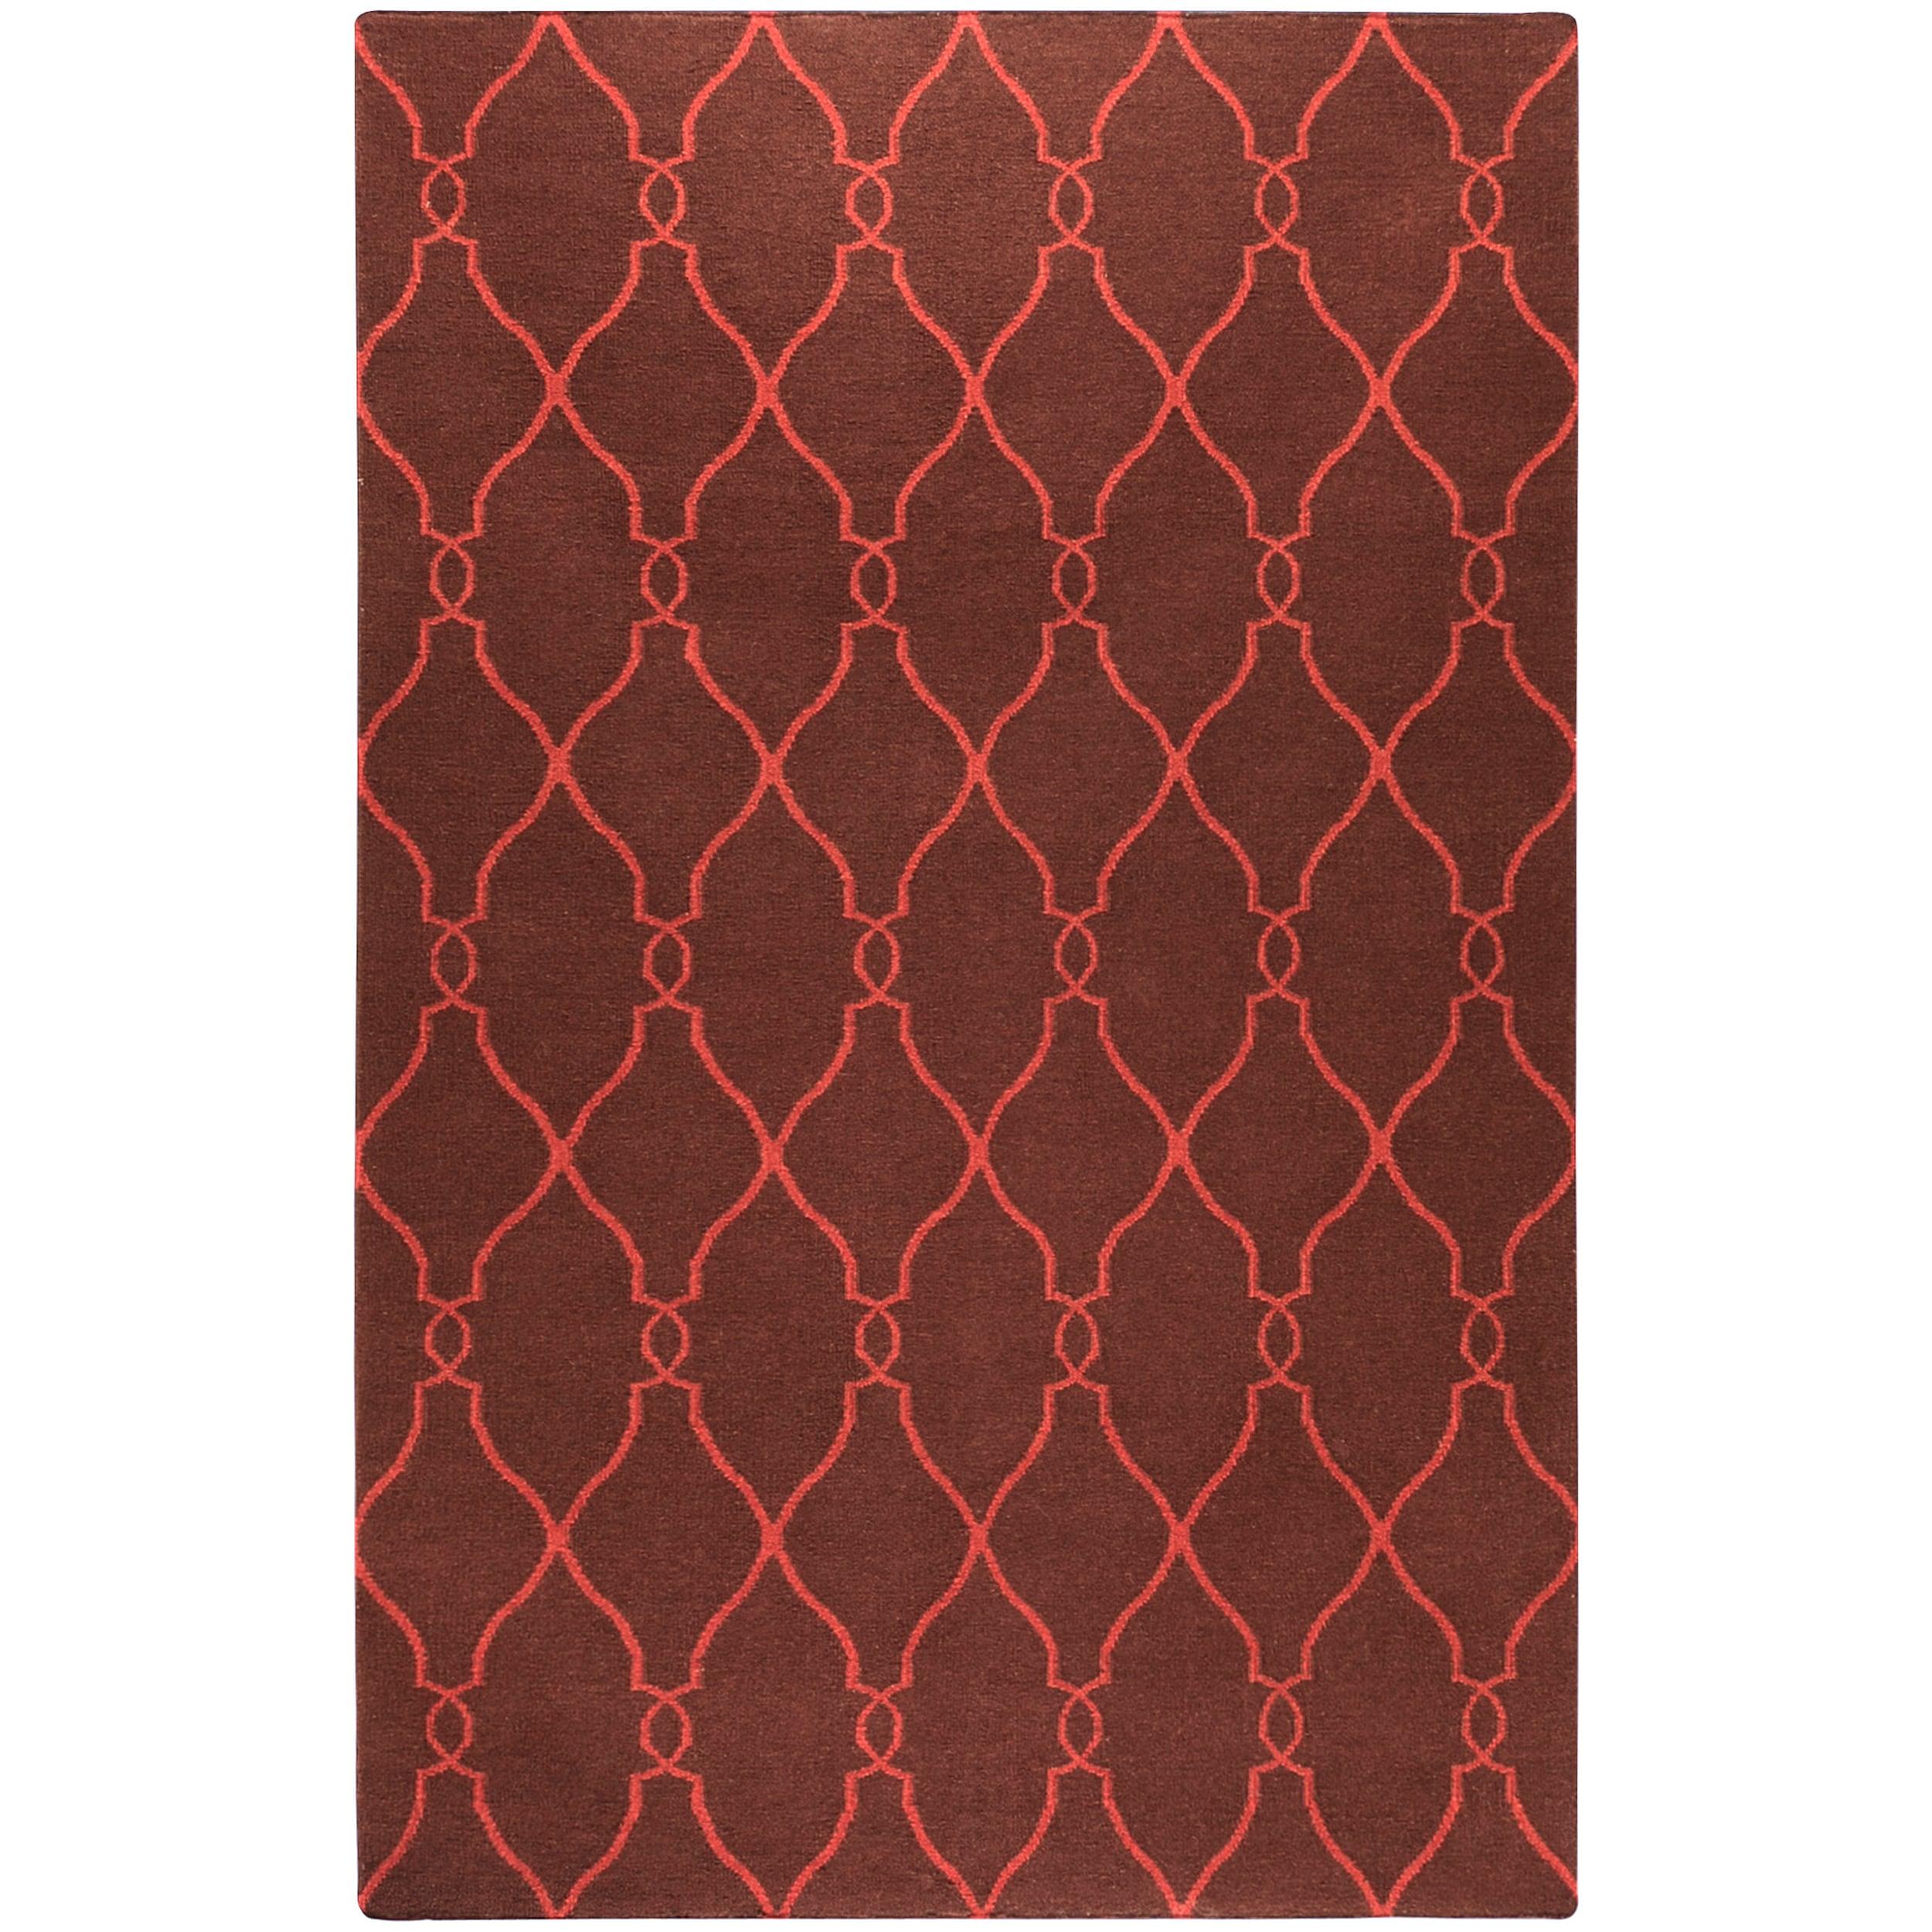 Hand Woven Bideford Wool Rug (5'X8')